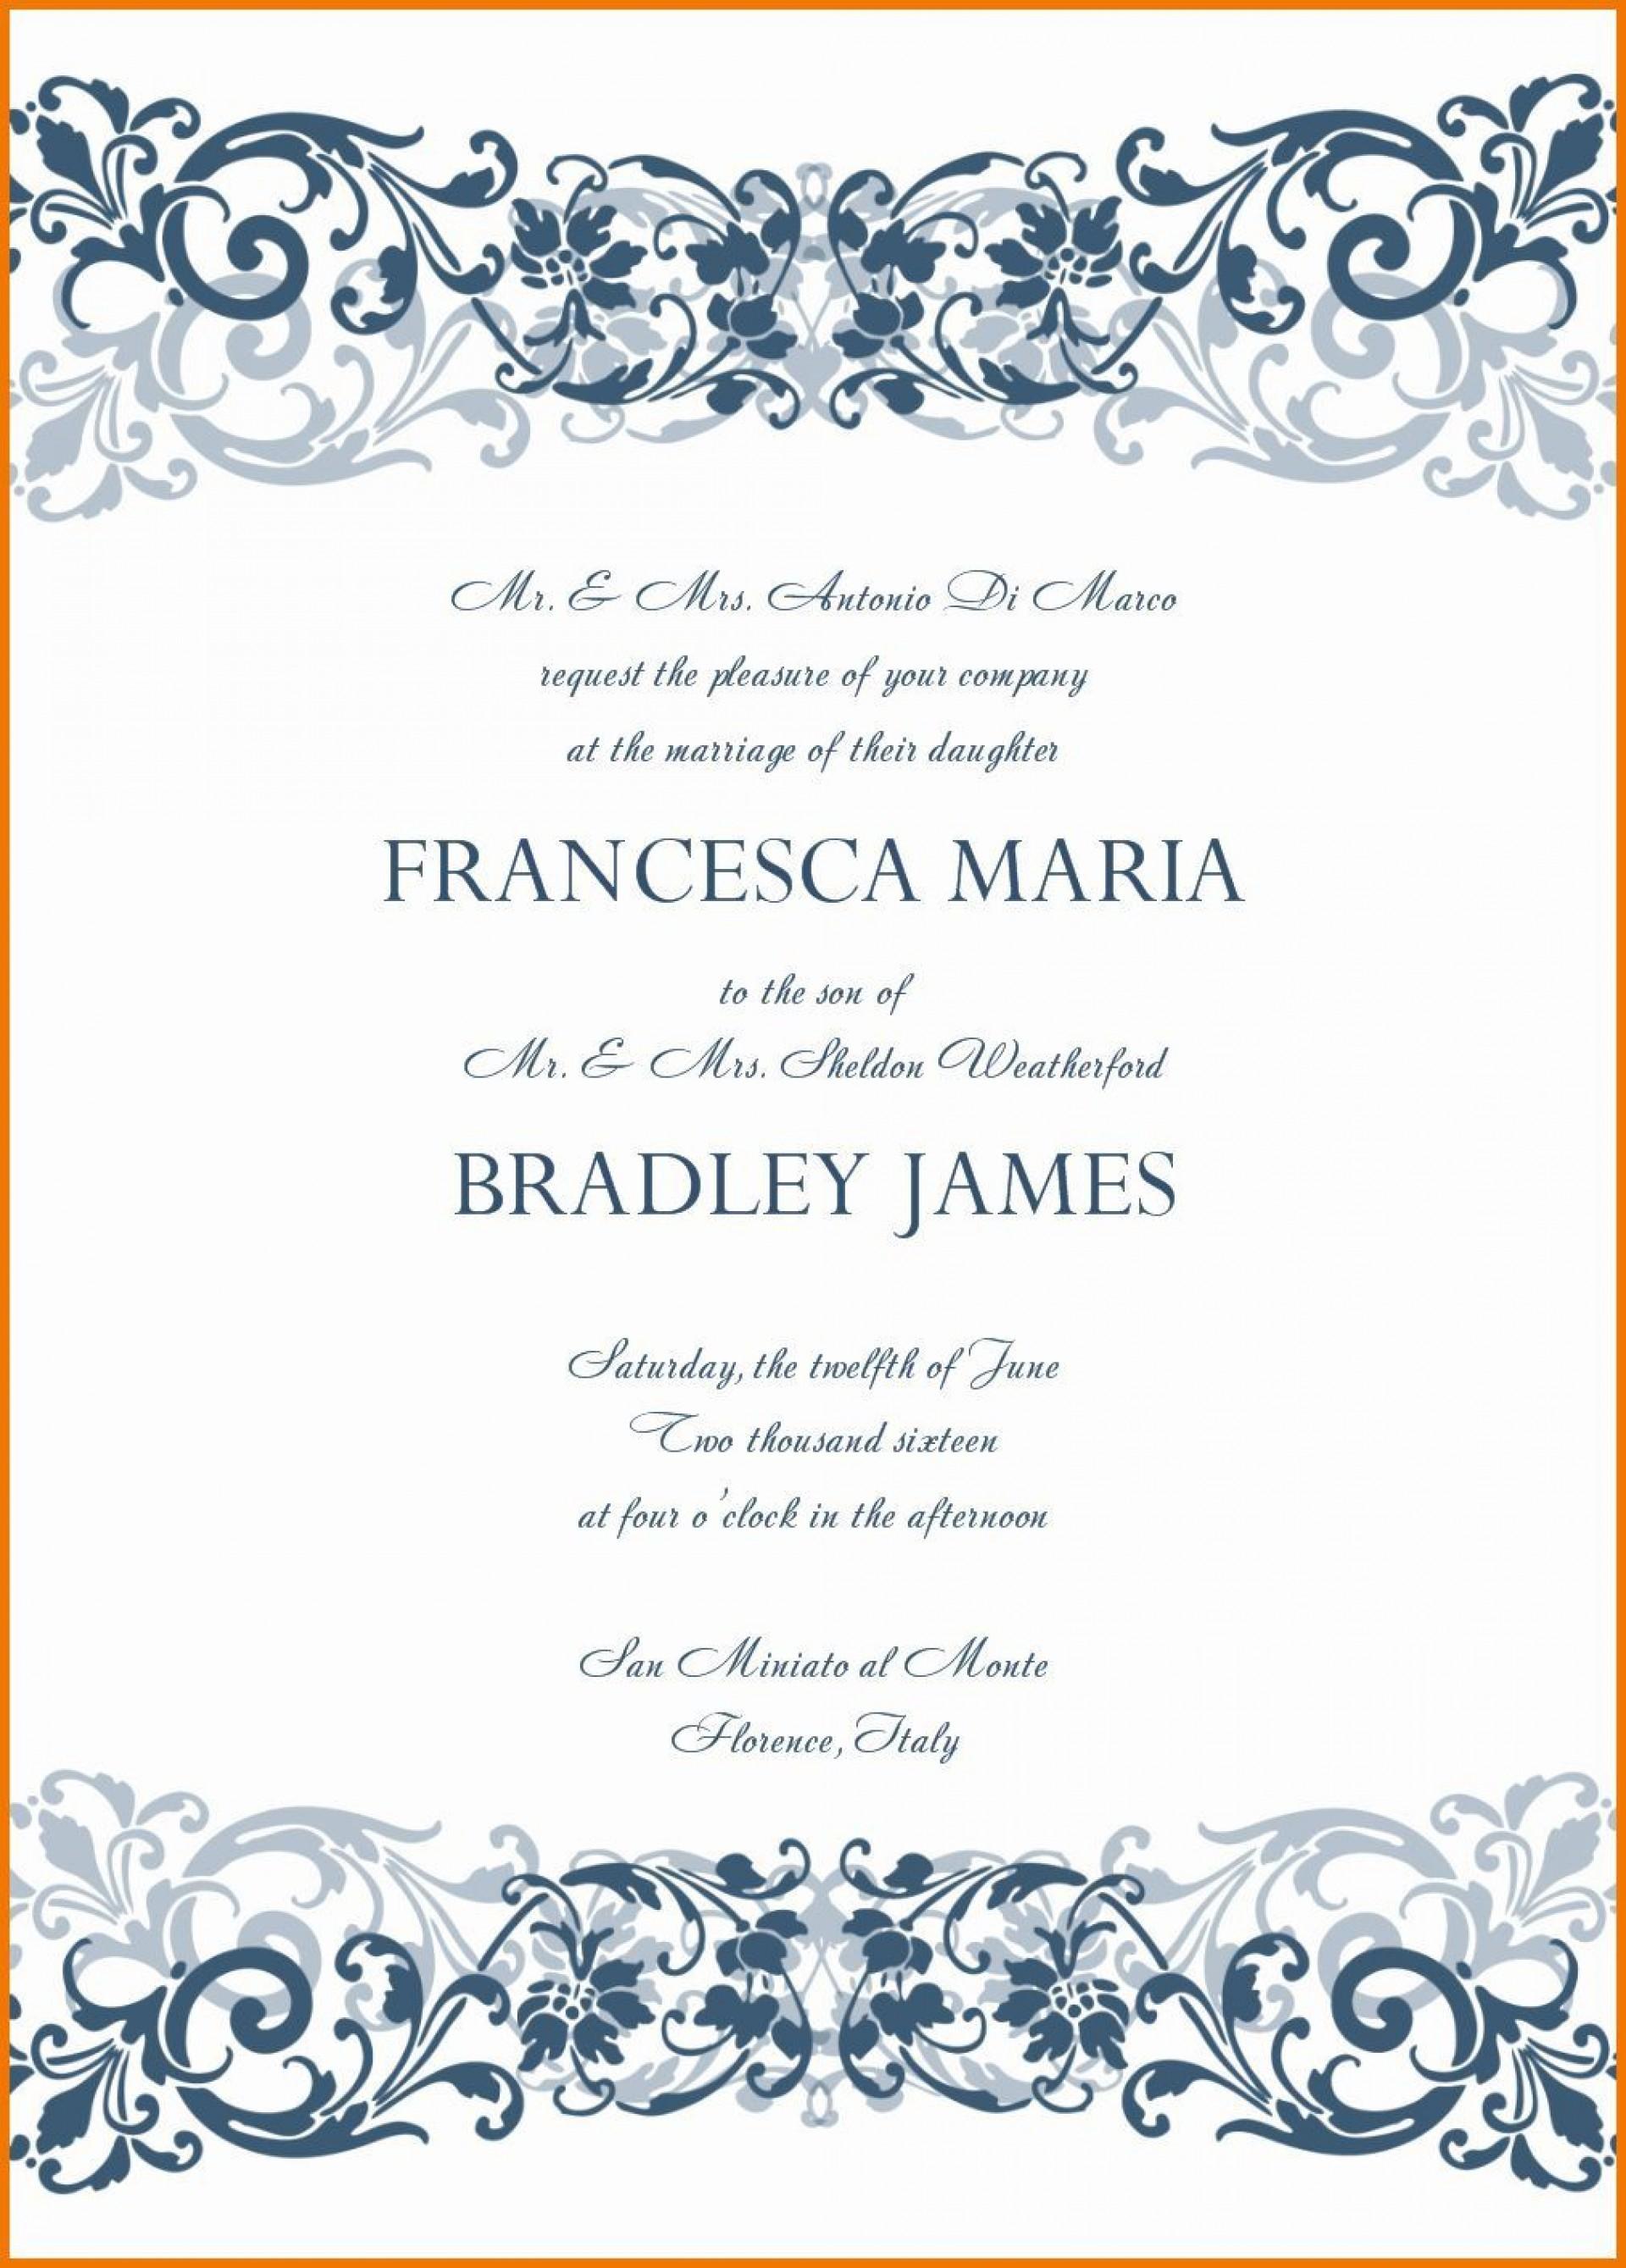 007 Unforgettable Microsoft Office Wedding Invitation Template Highest Clarity  Templates M1920